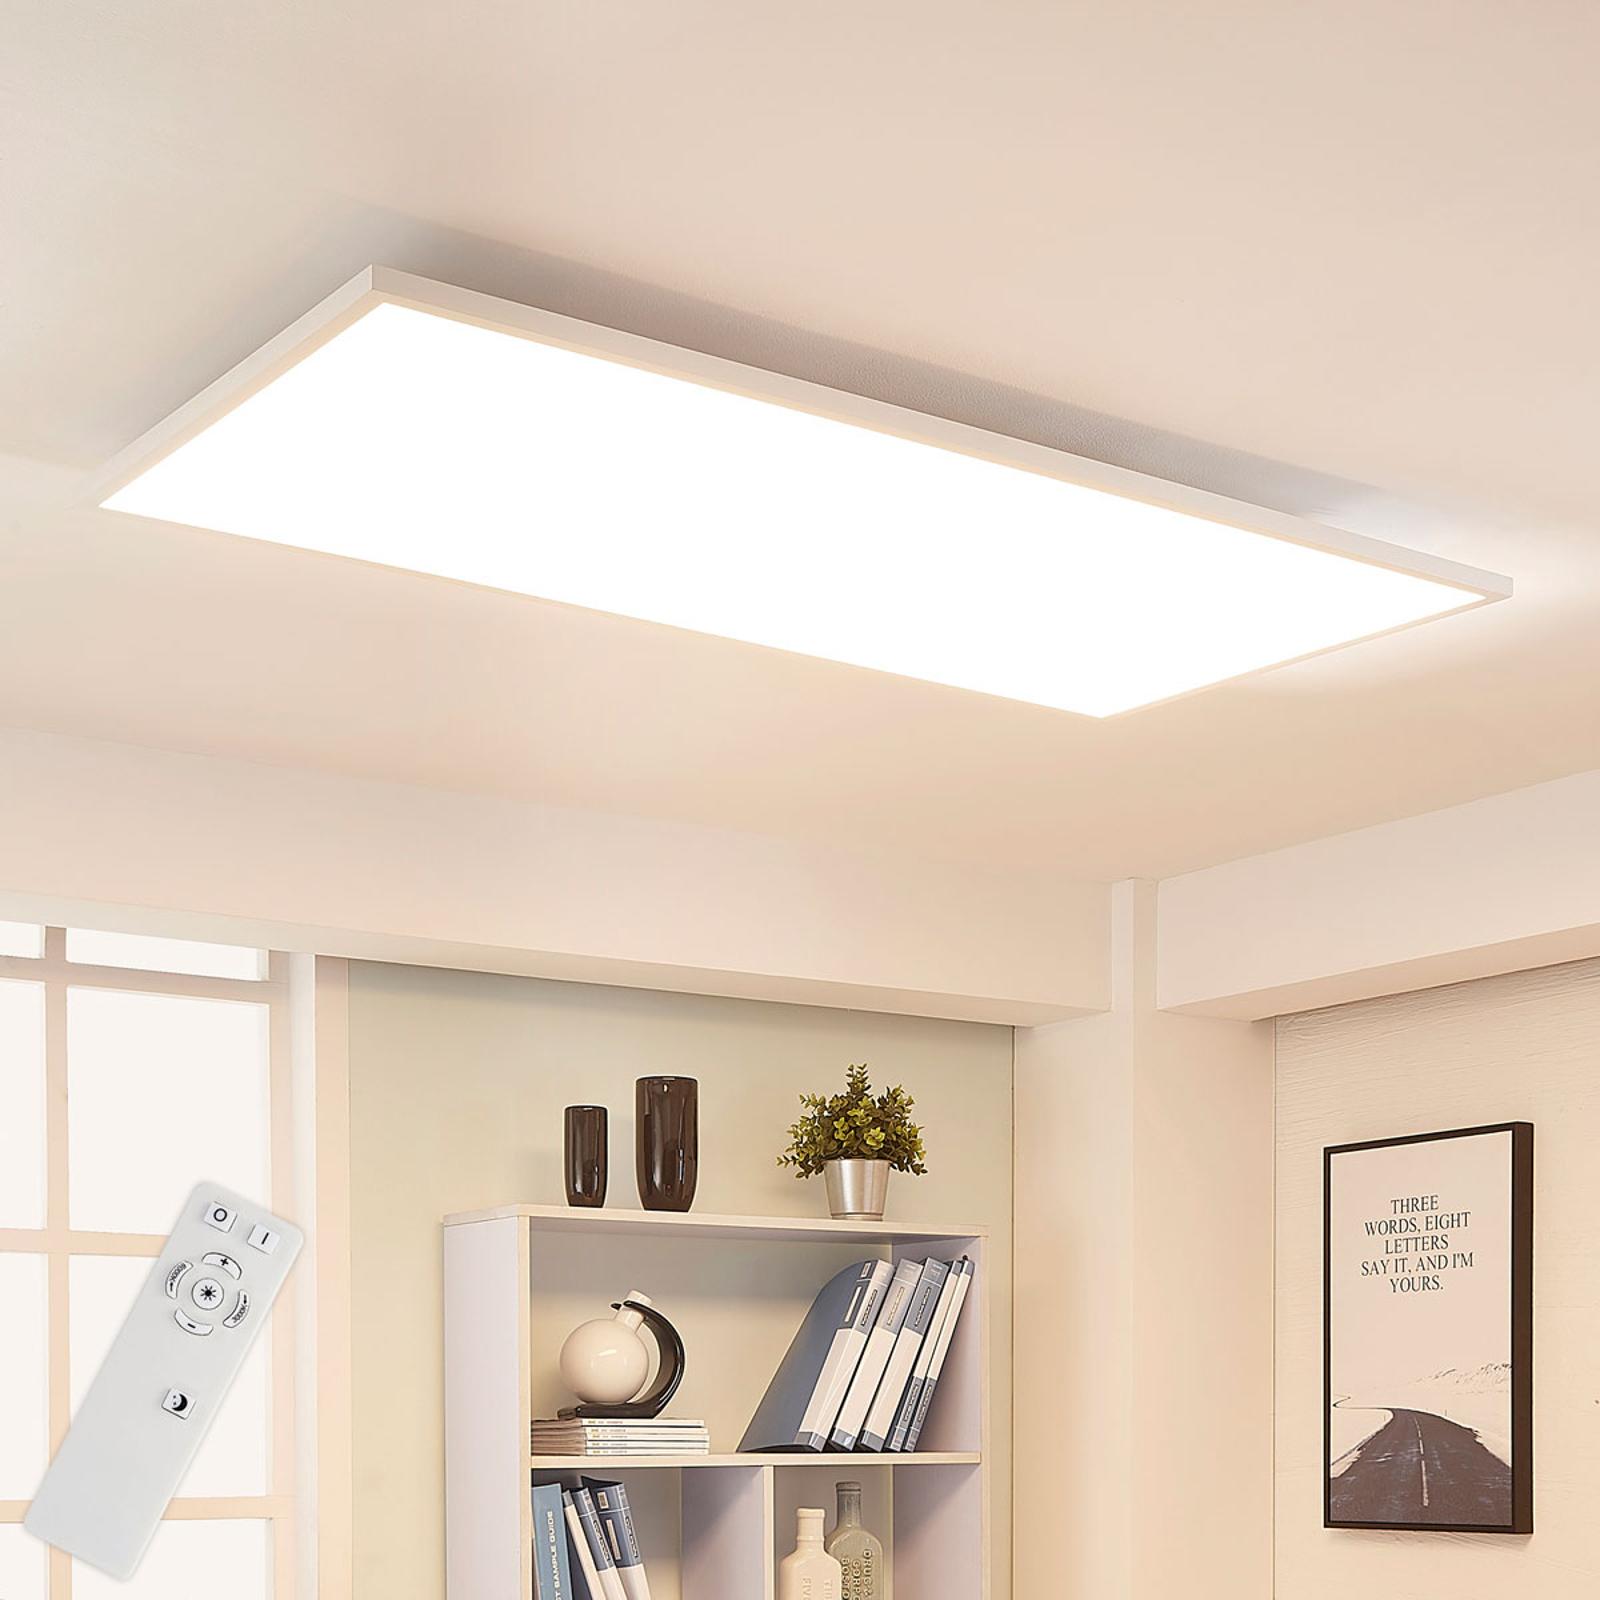 Acquista Pannello LED Arya dimmerabile a colore variabile